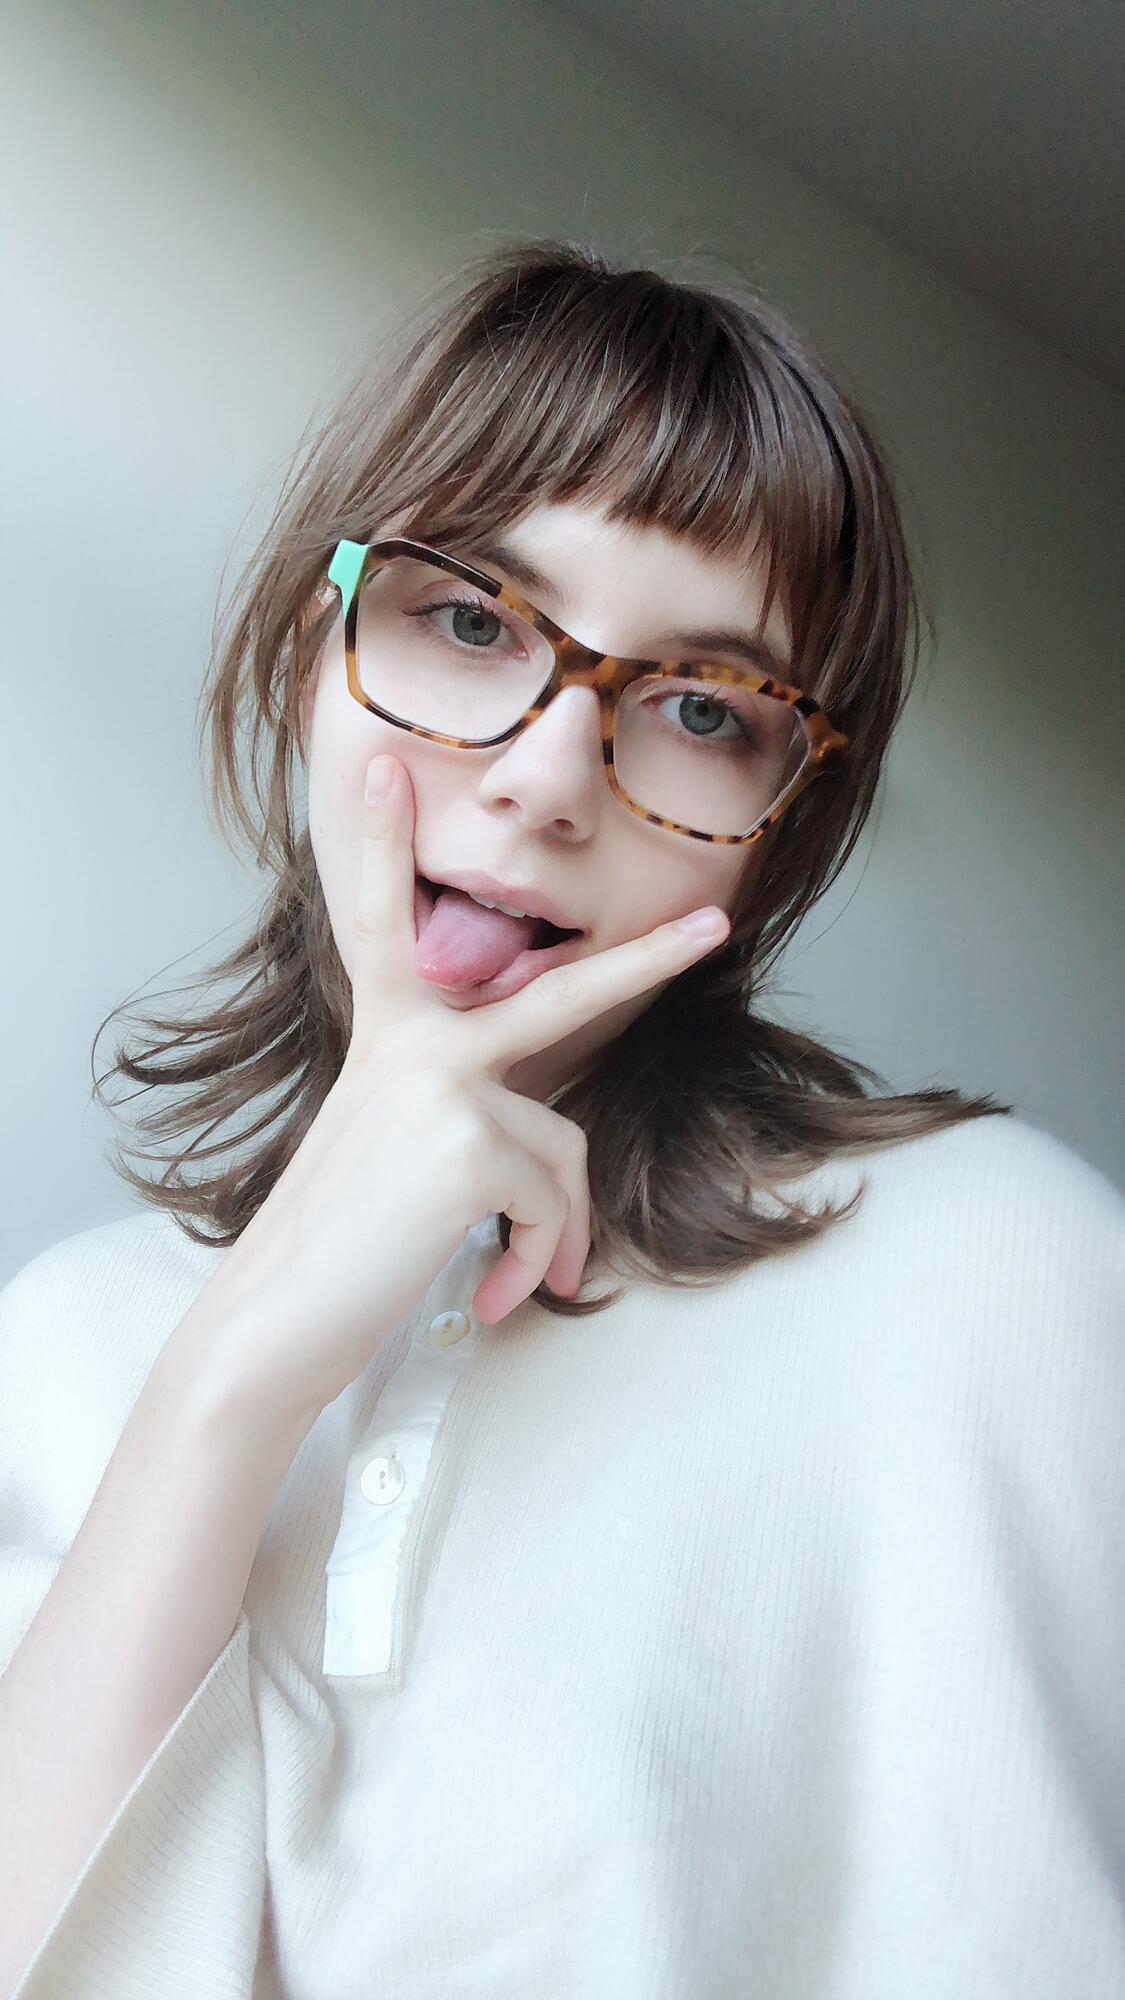 https://liararoux.xxx/wp-content/uploads/2018/10/Liara-Roux-Selfies-and-Snapshots-September-2018-039.jpg